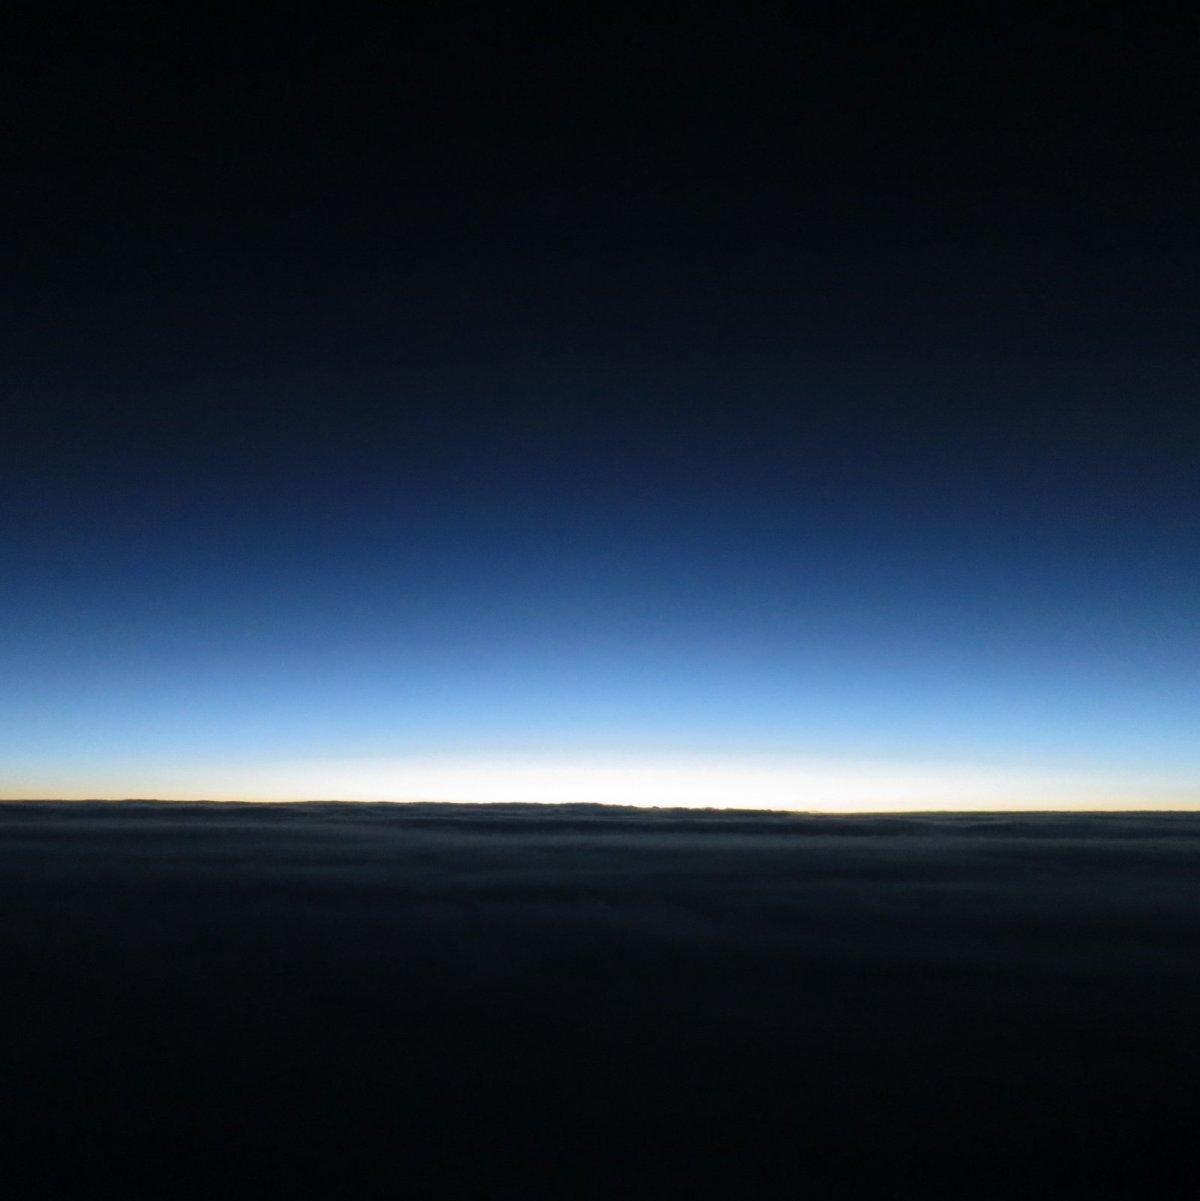 Pre-dawn horizon